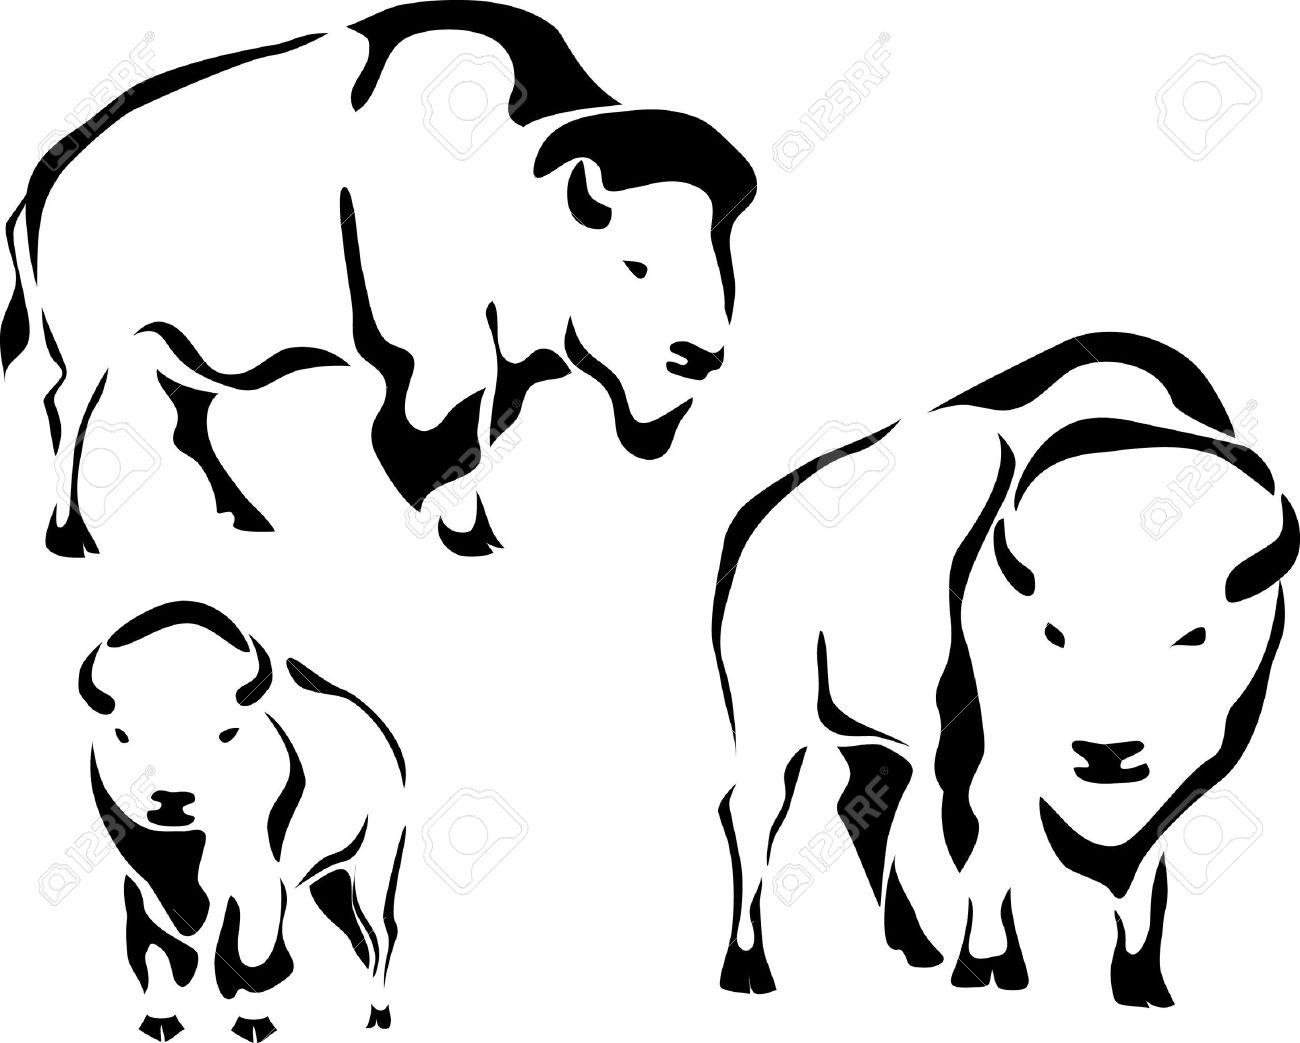 Bison clipart bufallo. Baby clip art buffalo